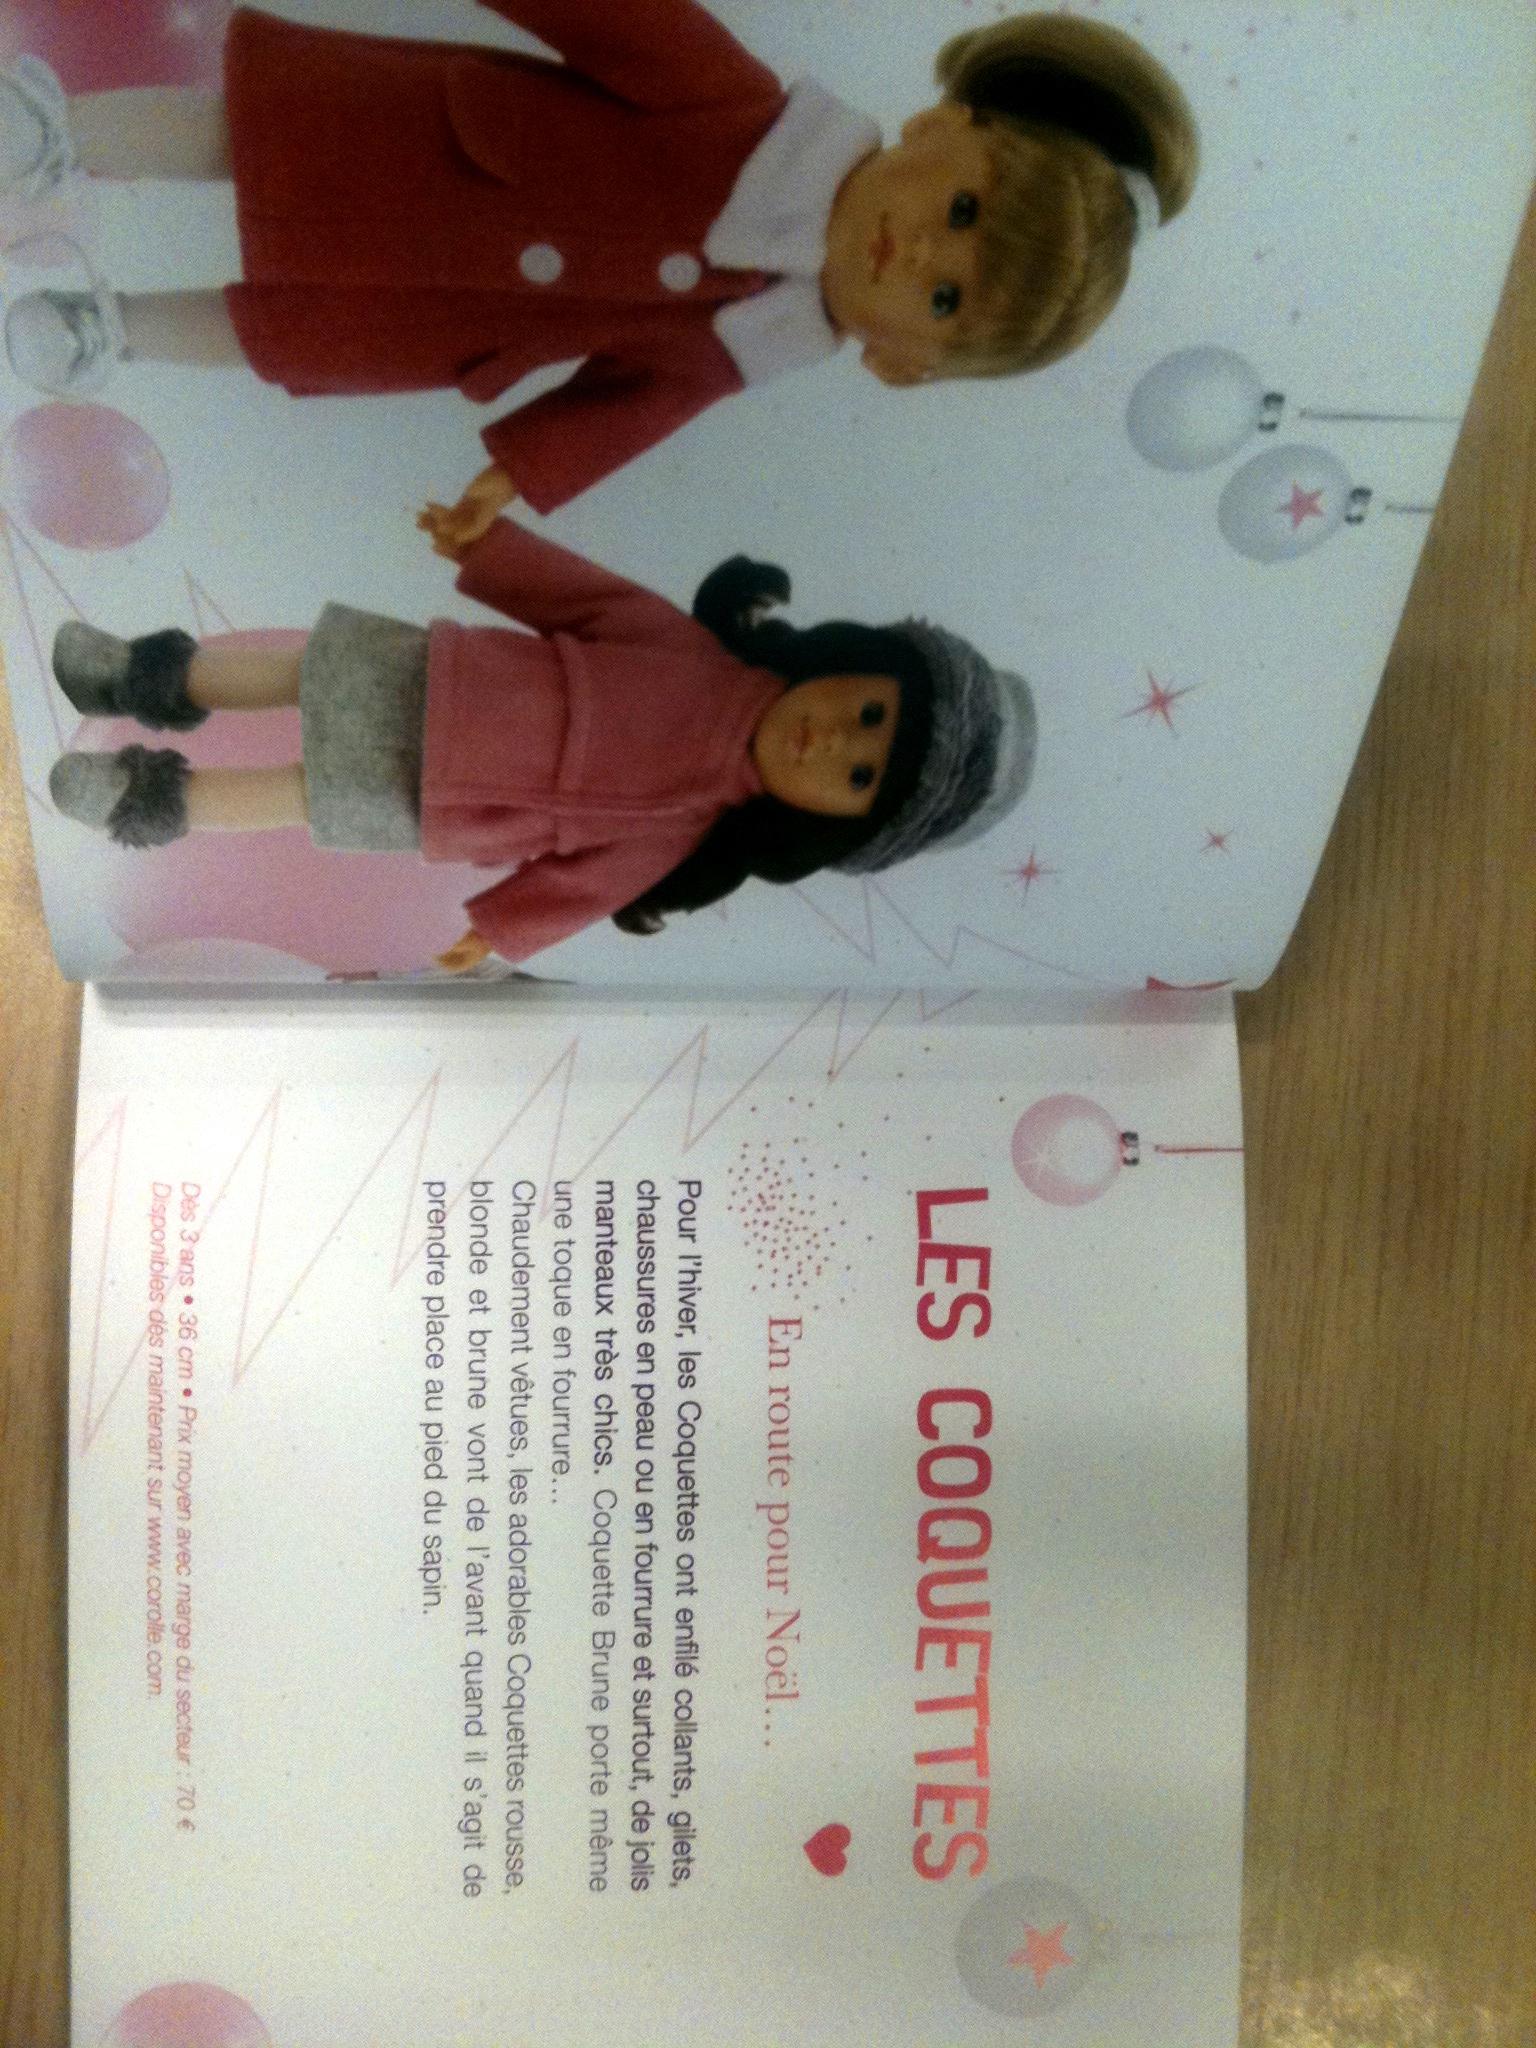 Cadeaux De Nol Sexistes Le Carton Rose De Corolle Une